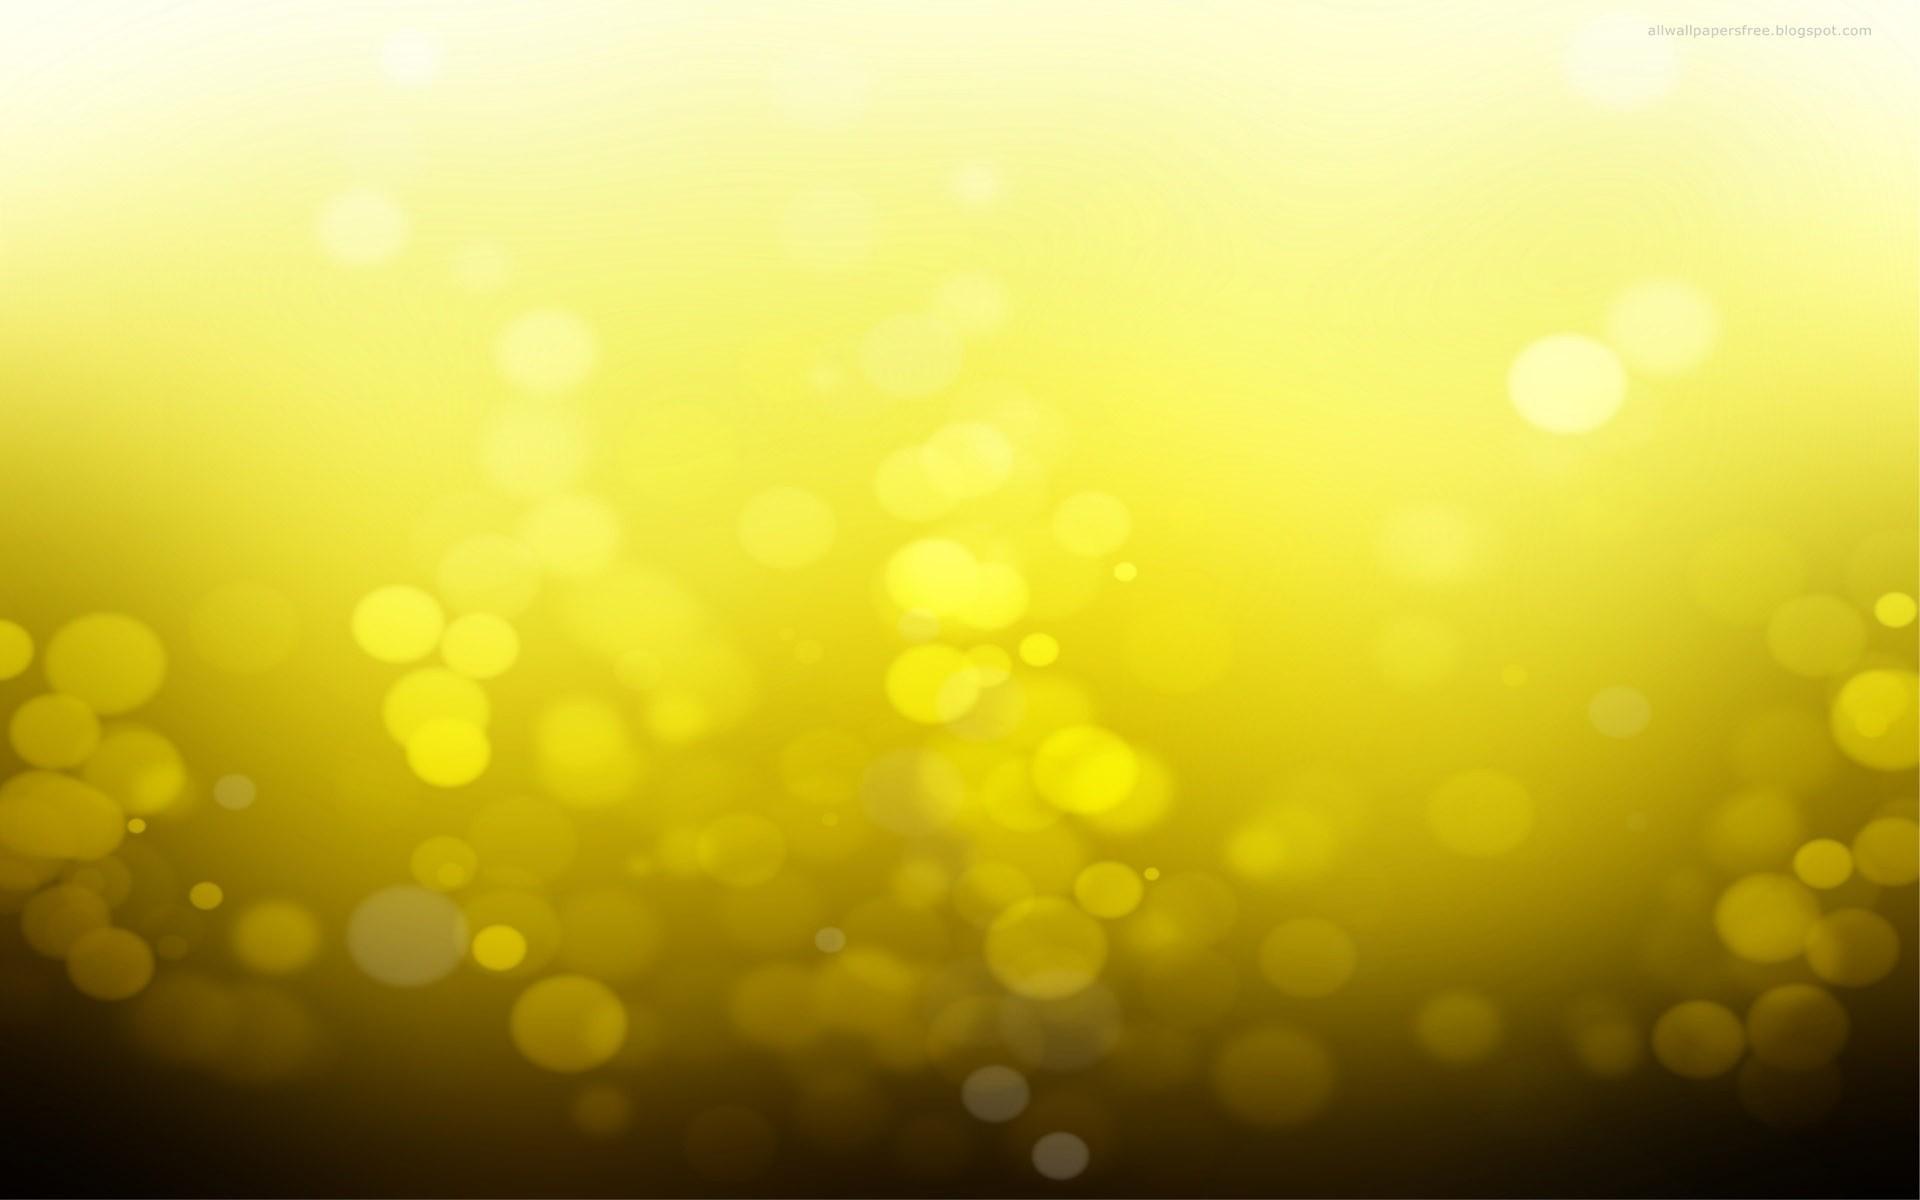 Download 99 Wallpaper Abstract Yellow Black Foto Gratis